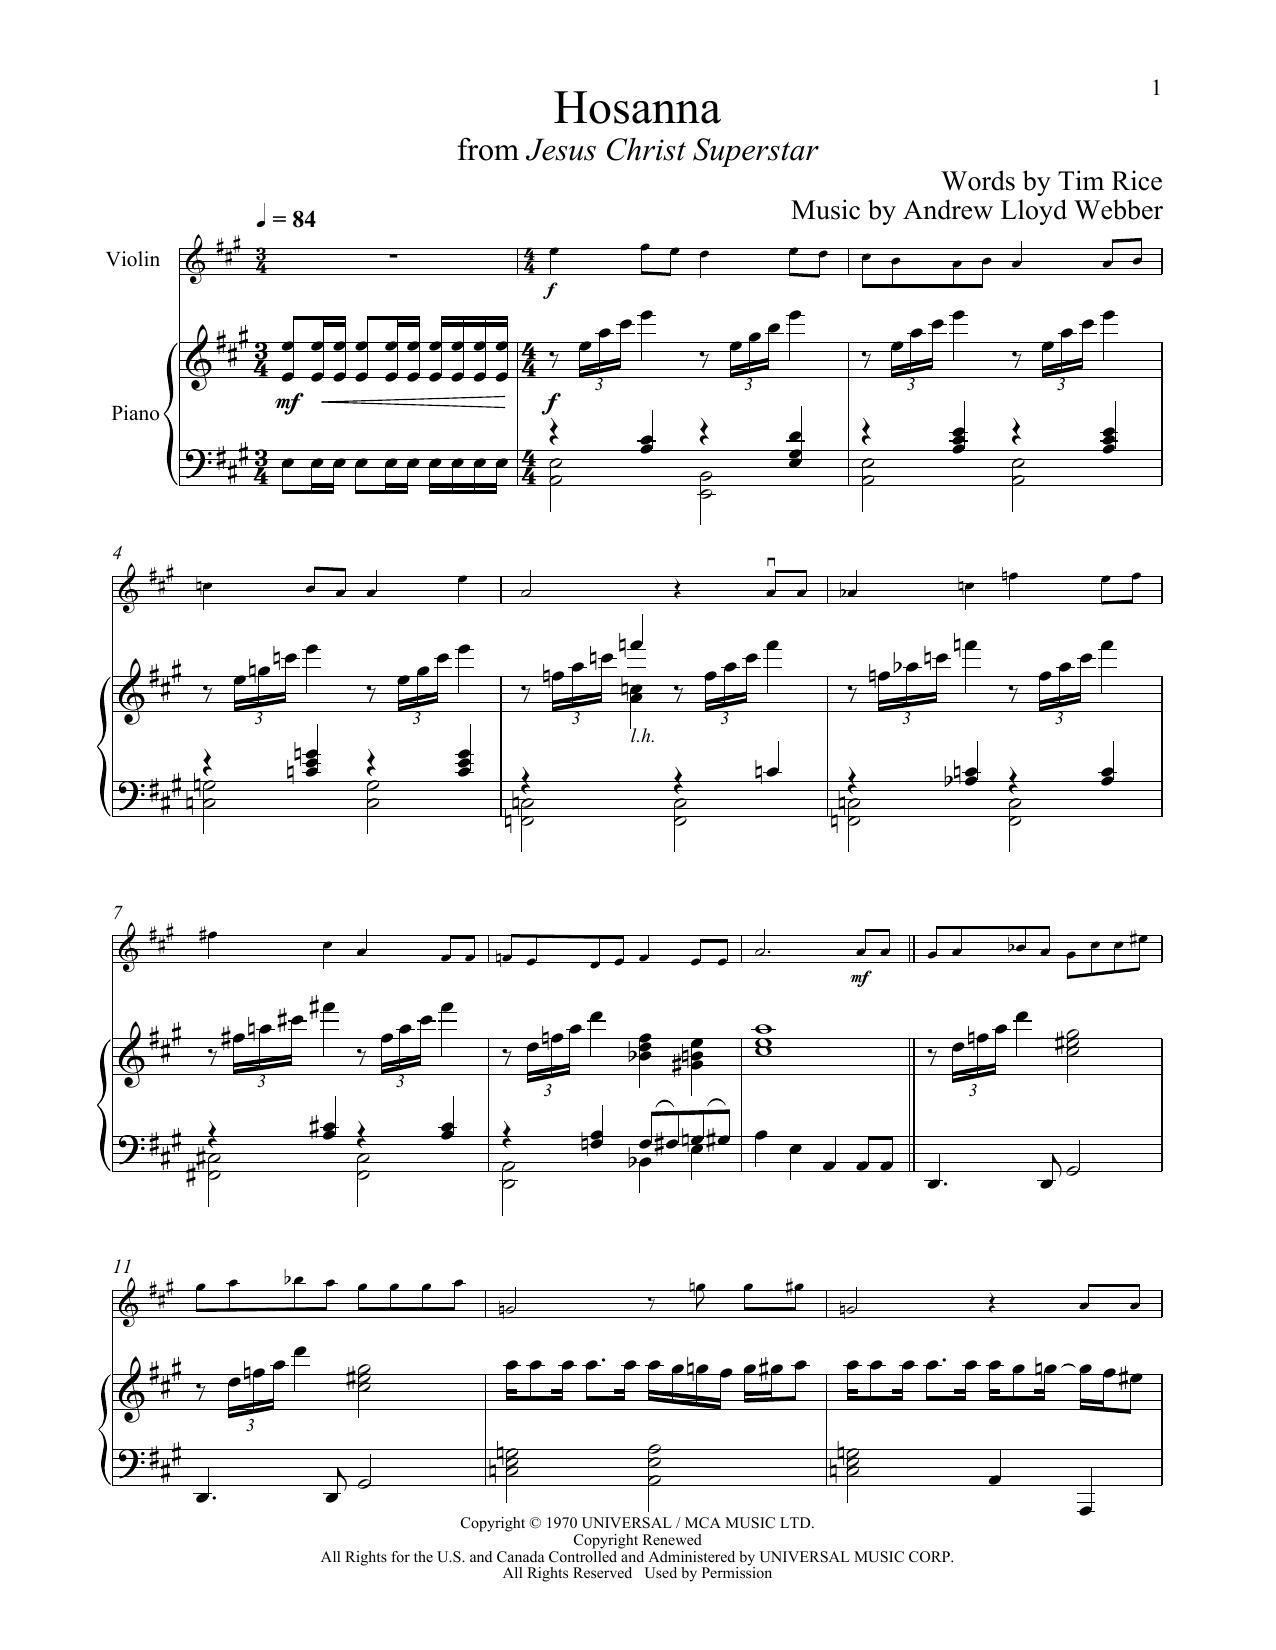 Hosanna (from Jesus Christ Superstar) (Violin and Piano)